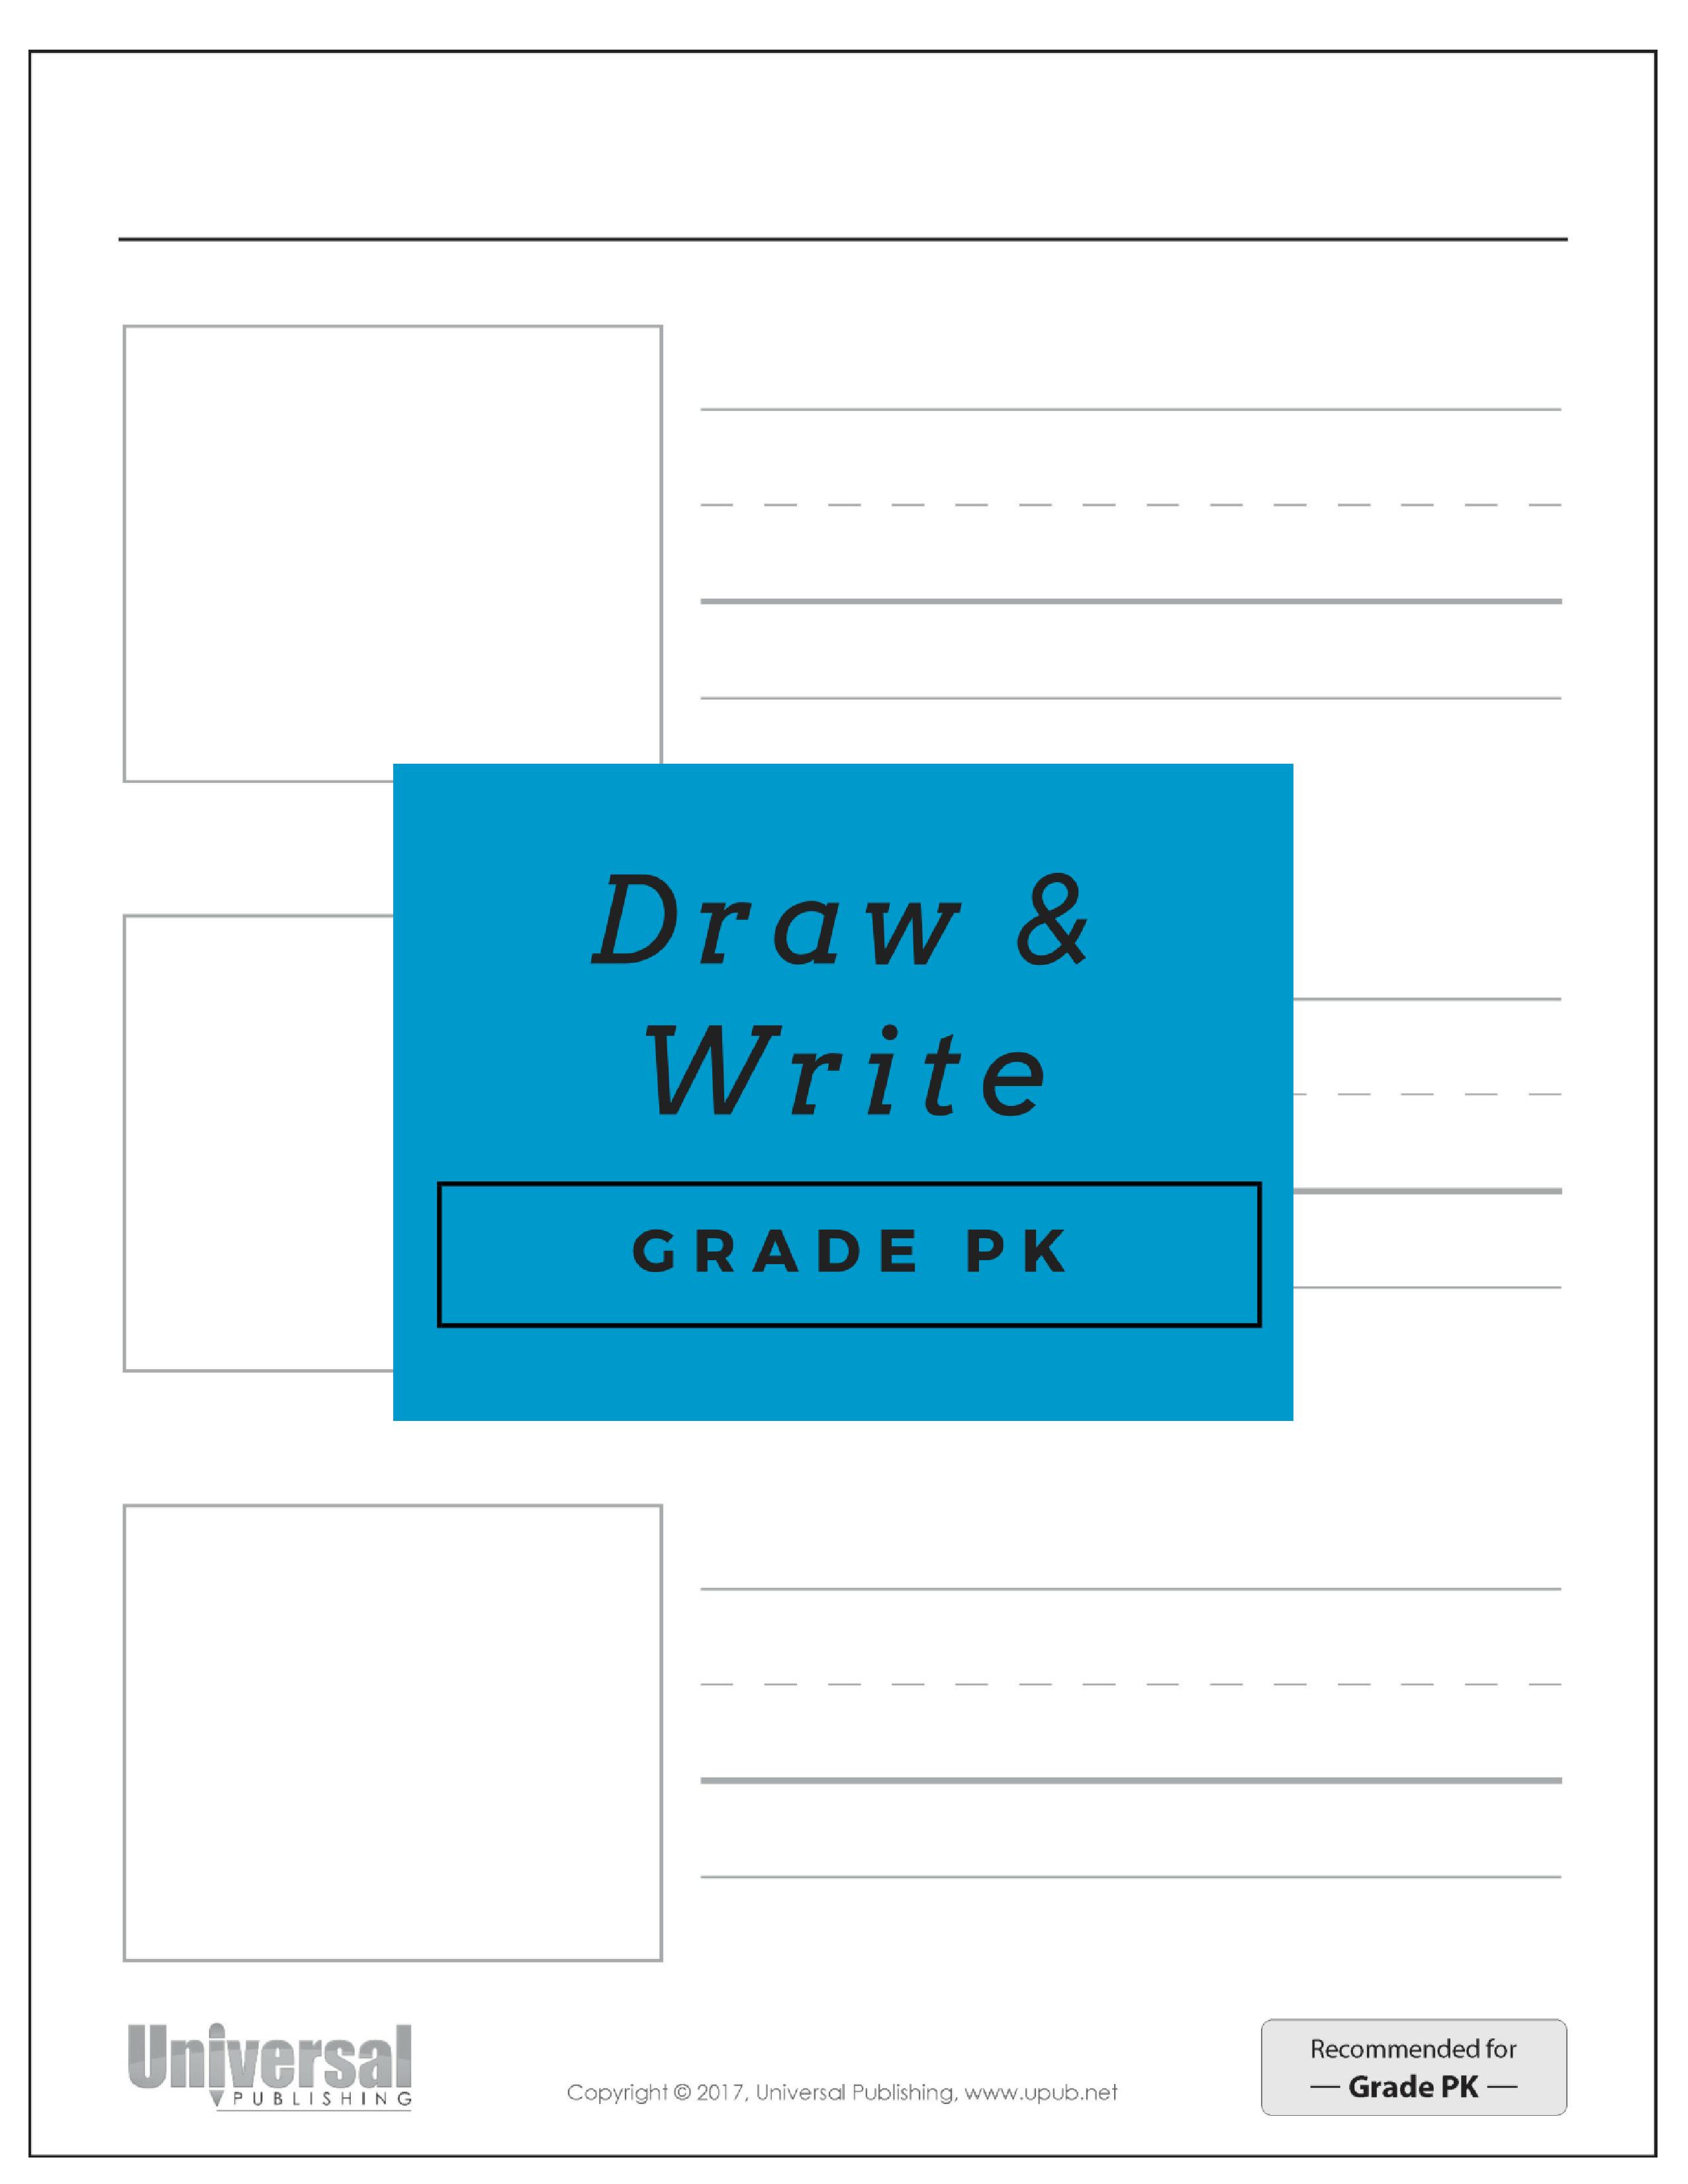 Free Worksheets - Free Printable Versatiles Worksheets | Free Printables | Free Printable Versatiles Worksheets